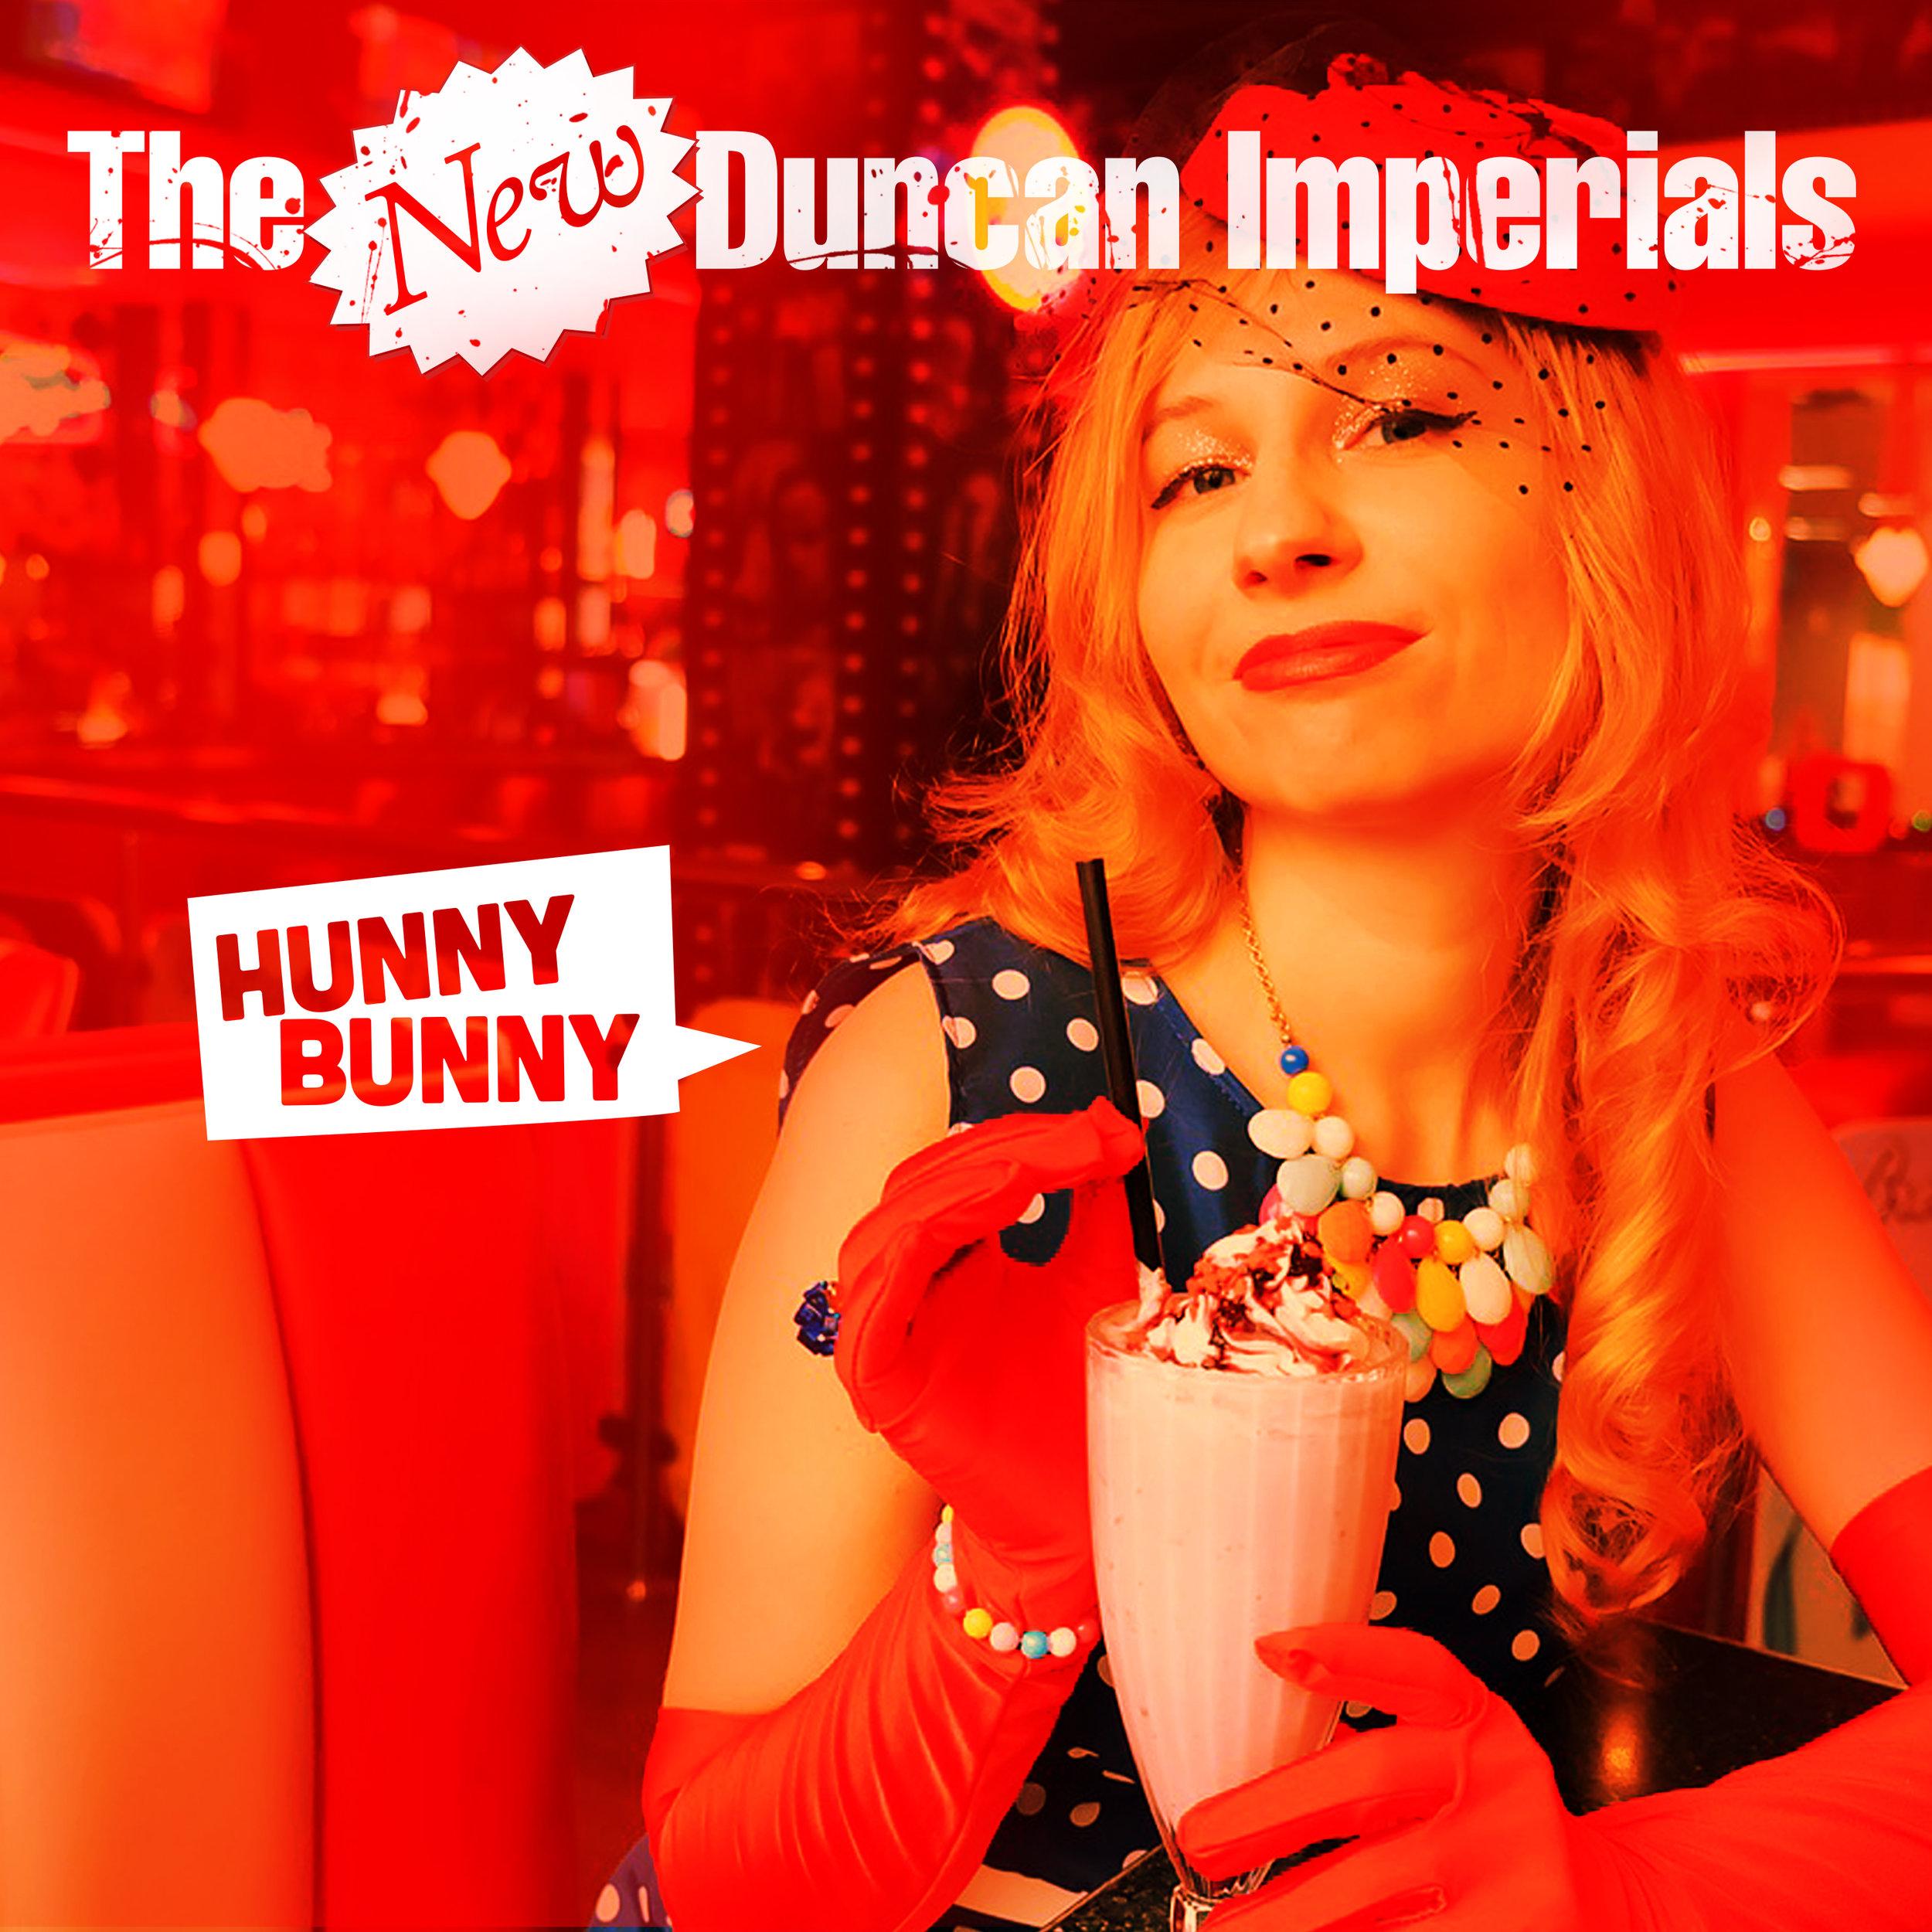 HUNNY BUNNY (2019) - Spotify